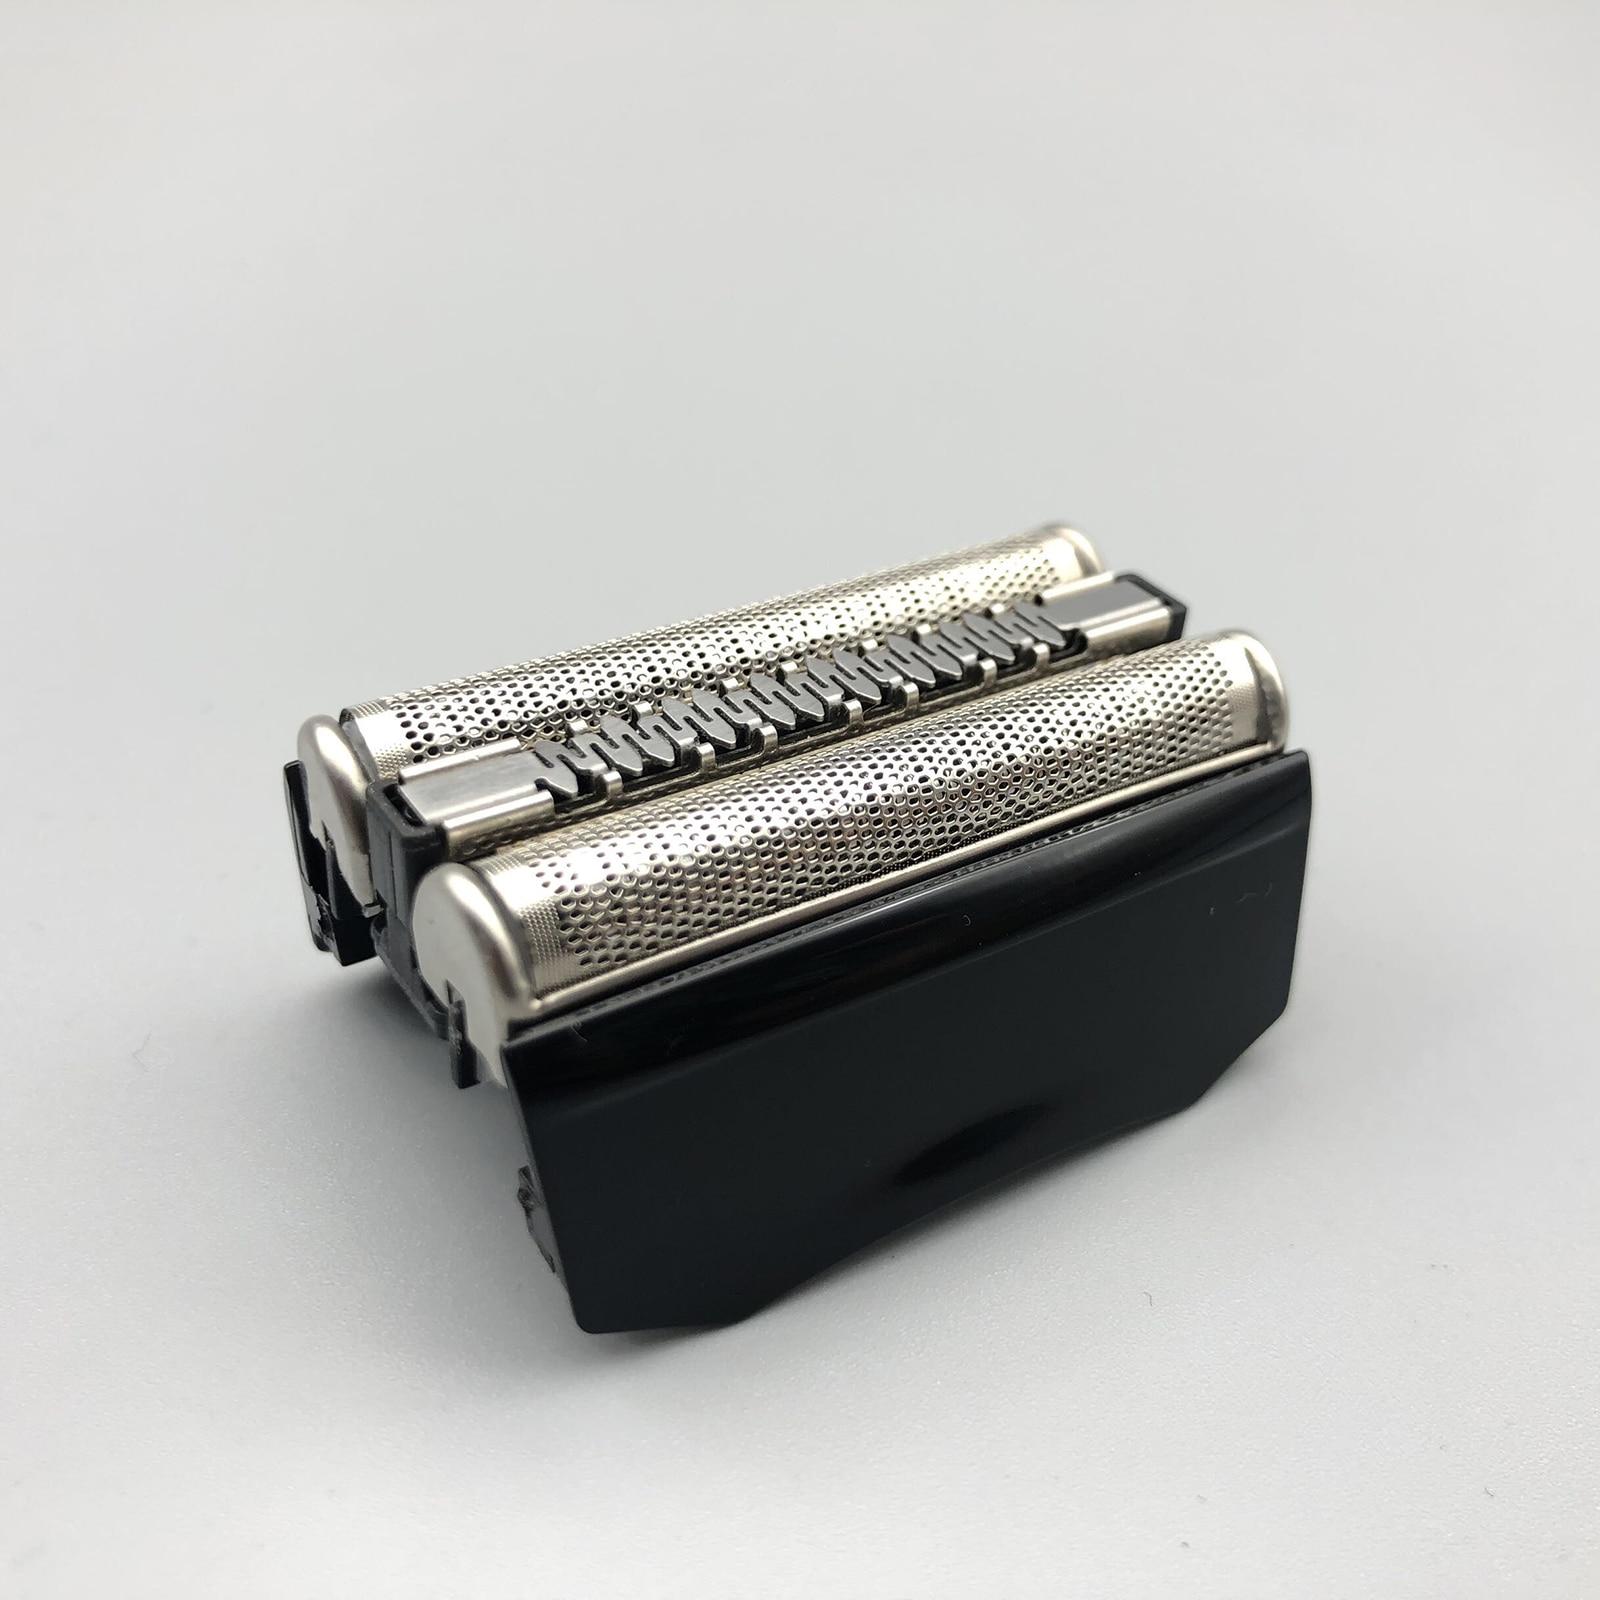 Foil & Cutter Head Cassette Cartridge 70B 70S For BRAUN Electric Razor Shaver Series 7 720S 760CC 790CC 9595 9565 9781 Parts